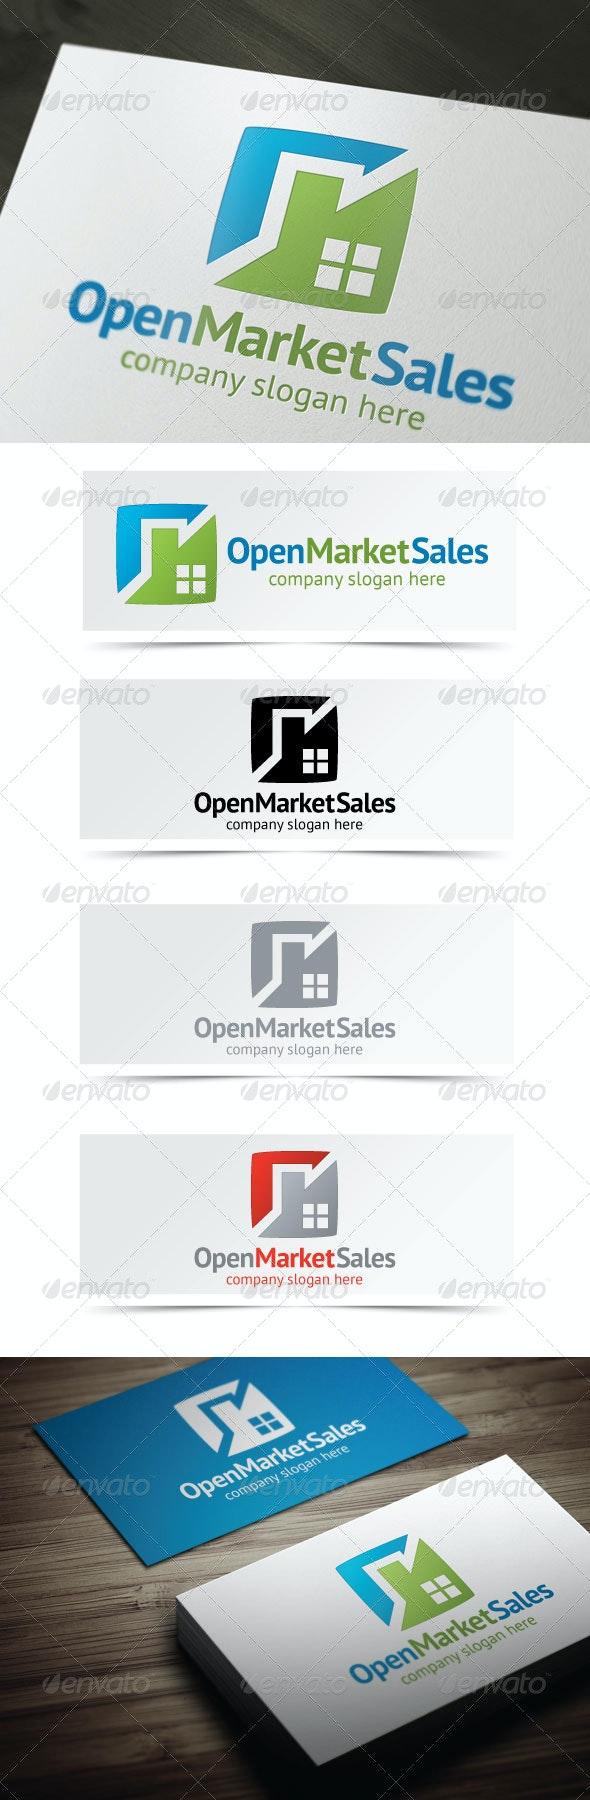 Open Market Sales